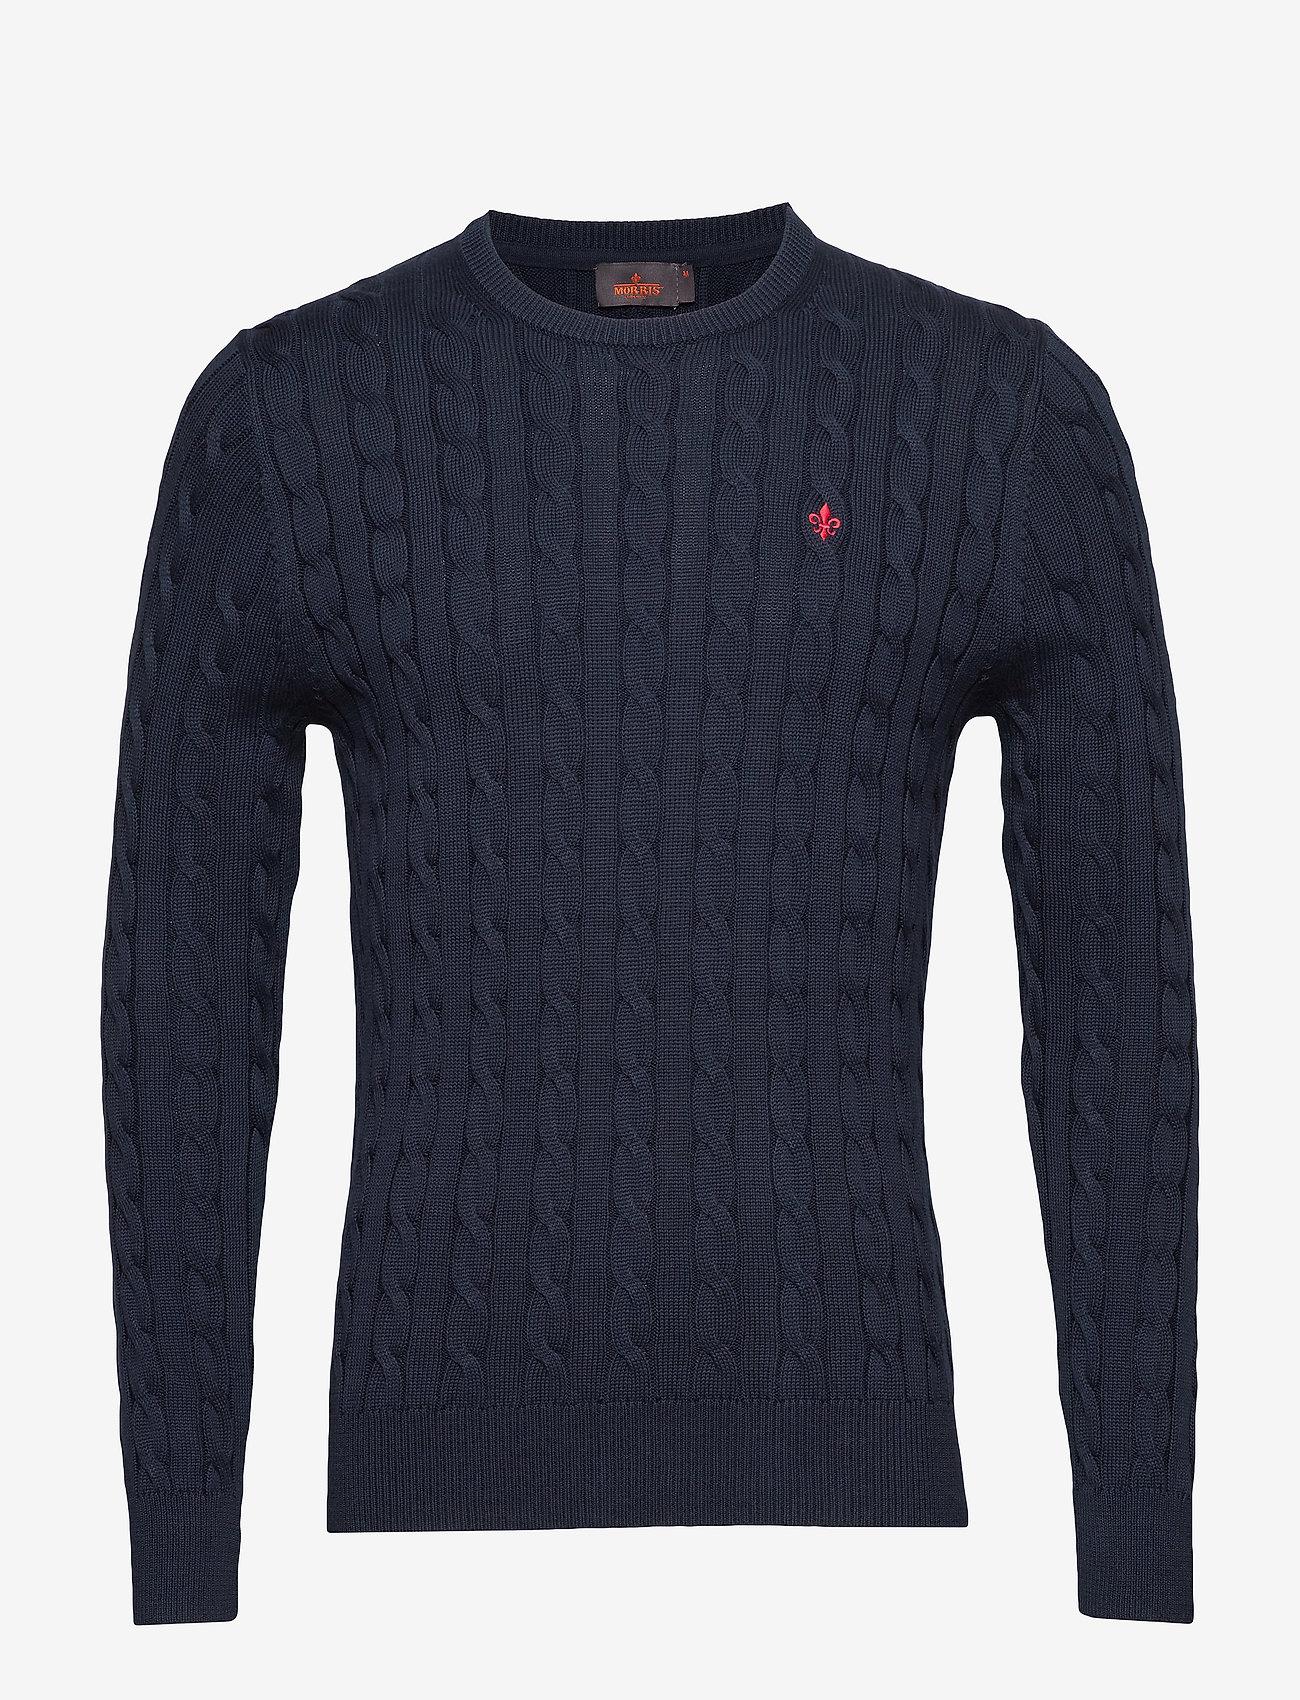 Morris - Pima Cotton Cable - basic knitwear - navy